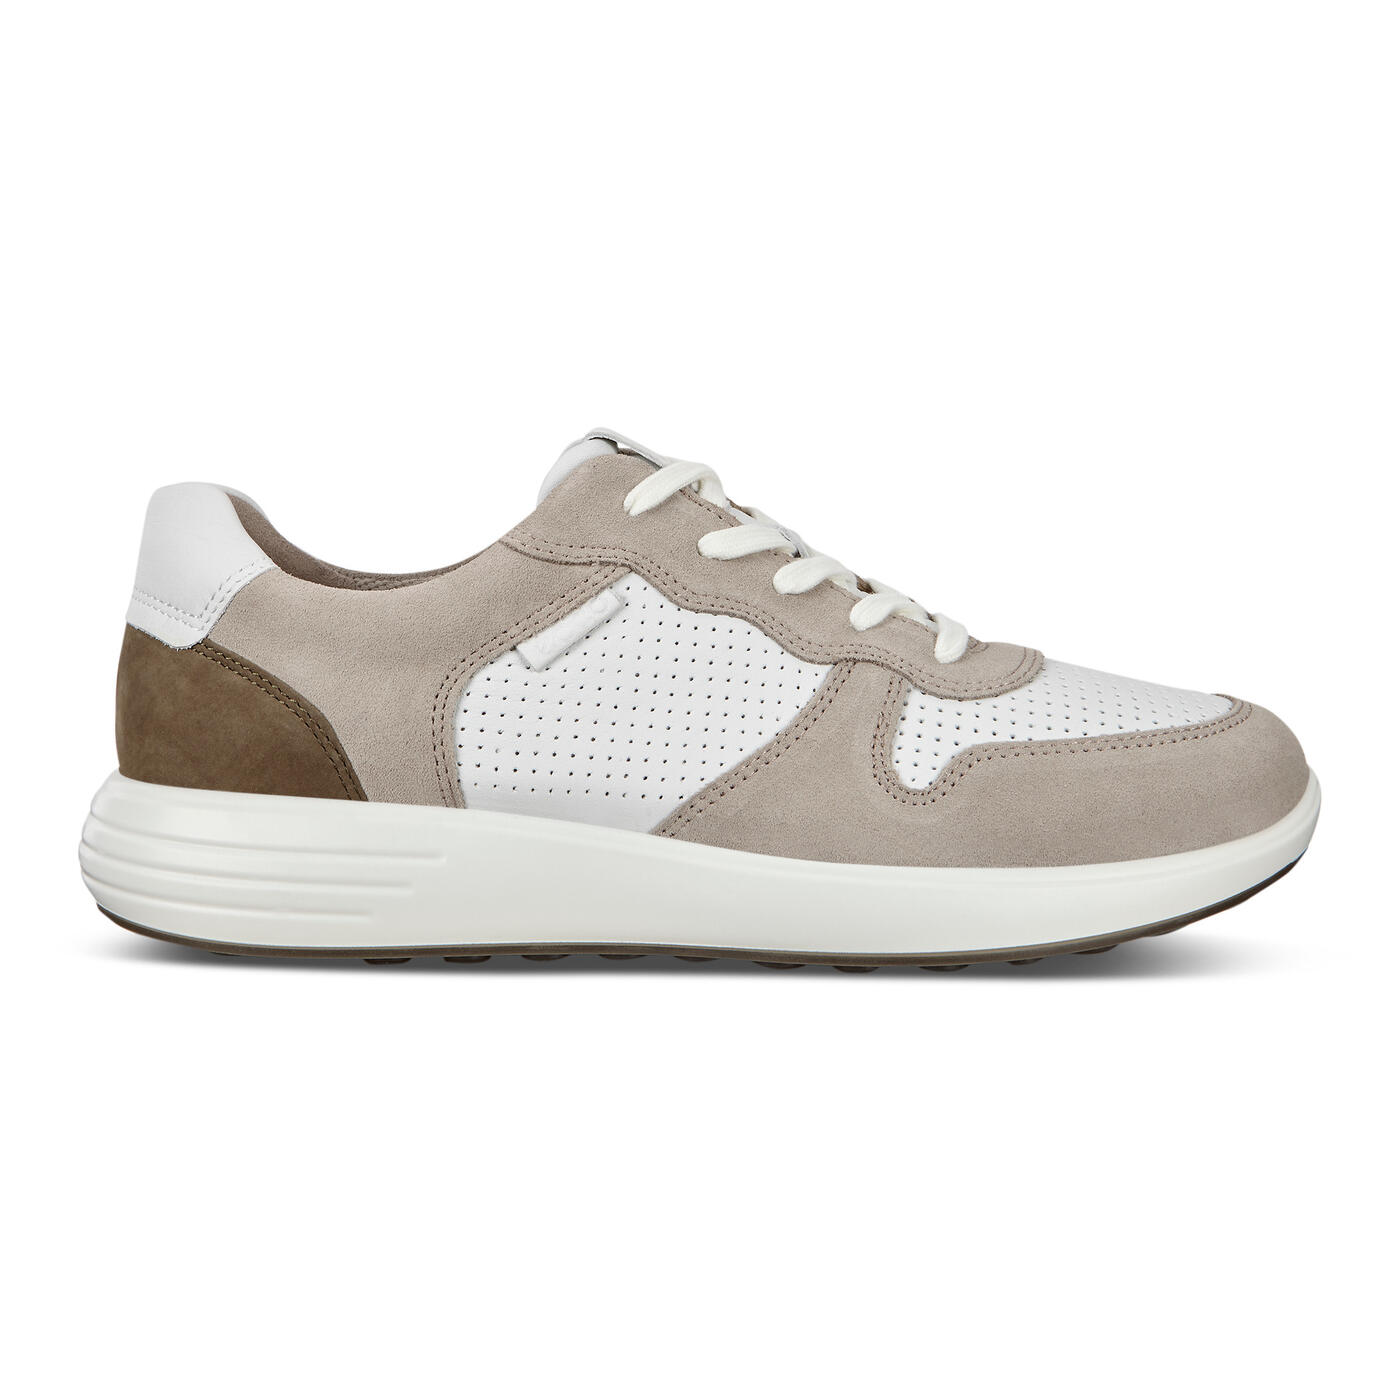 ECCO Soft 7 Runner Men's Perforated Sneakers